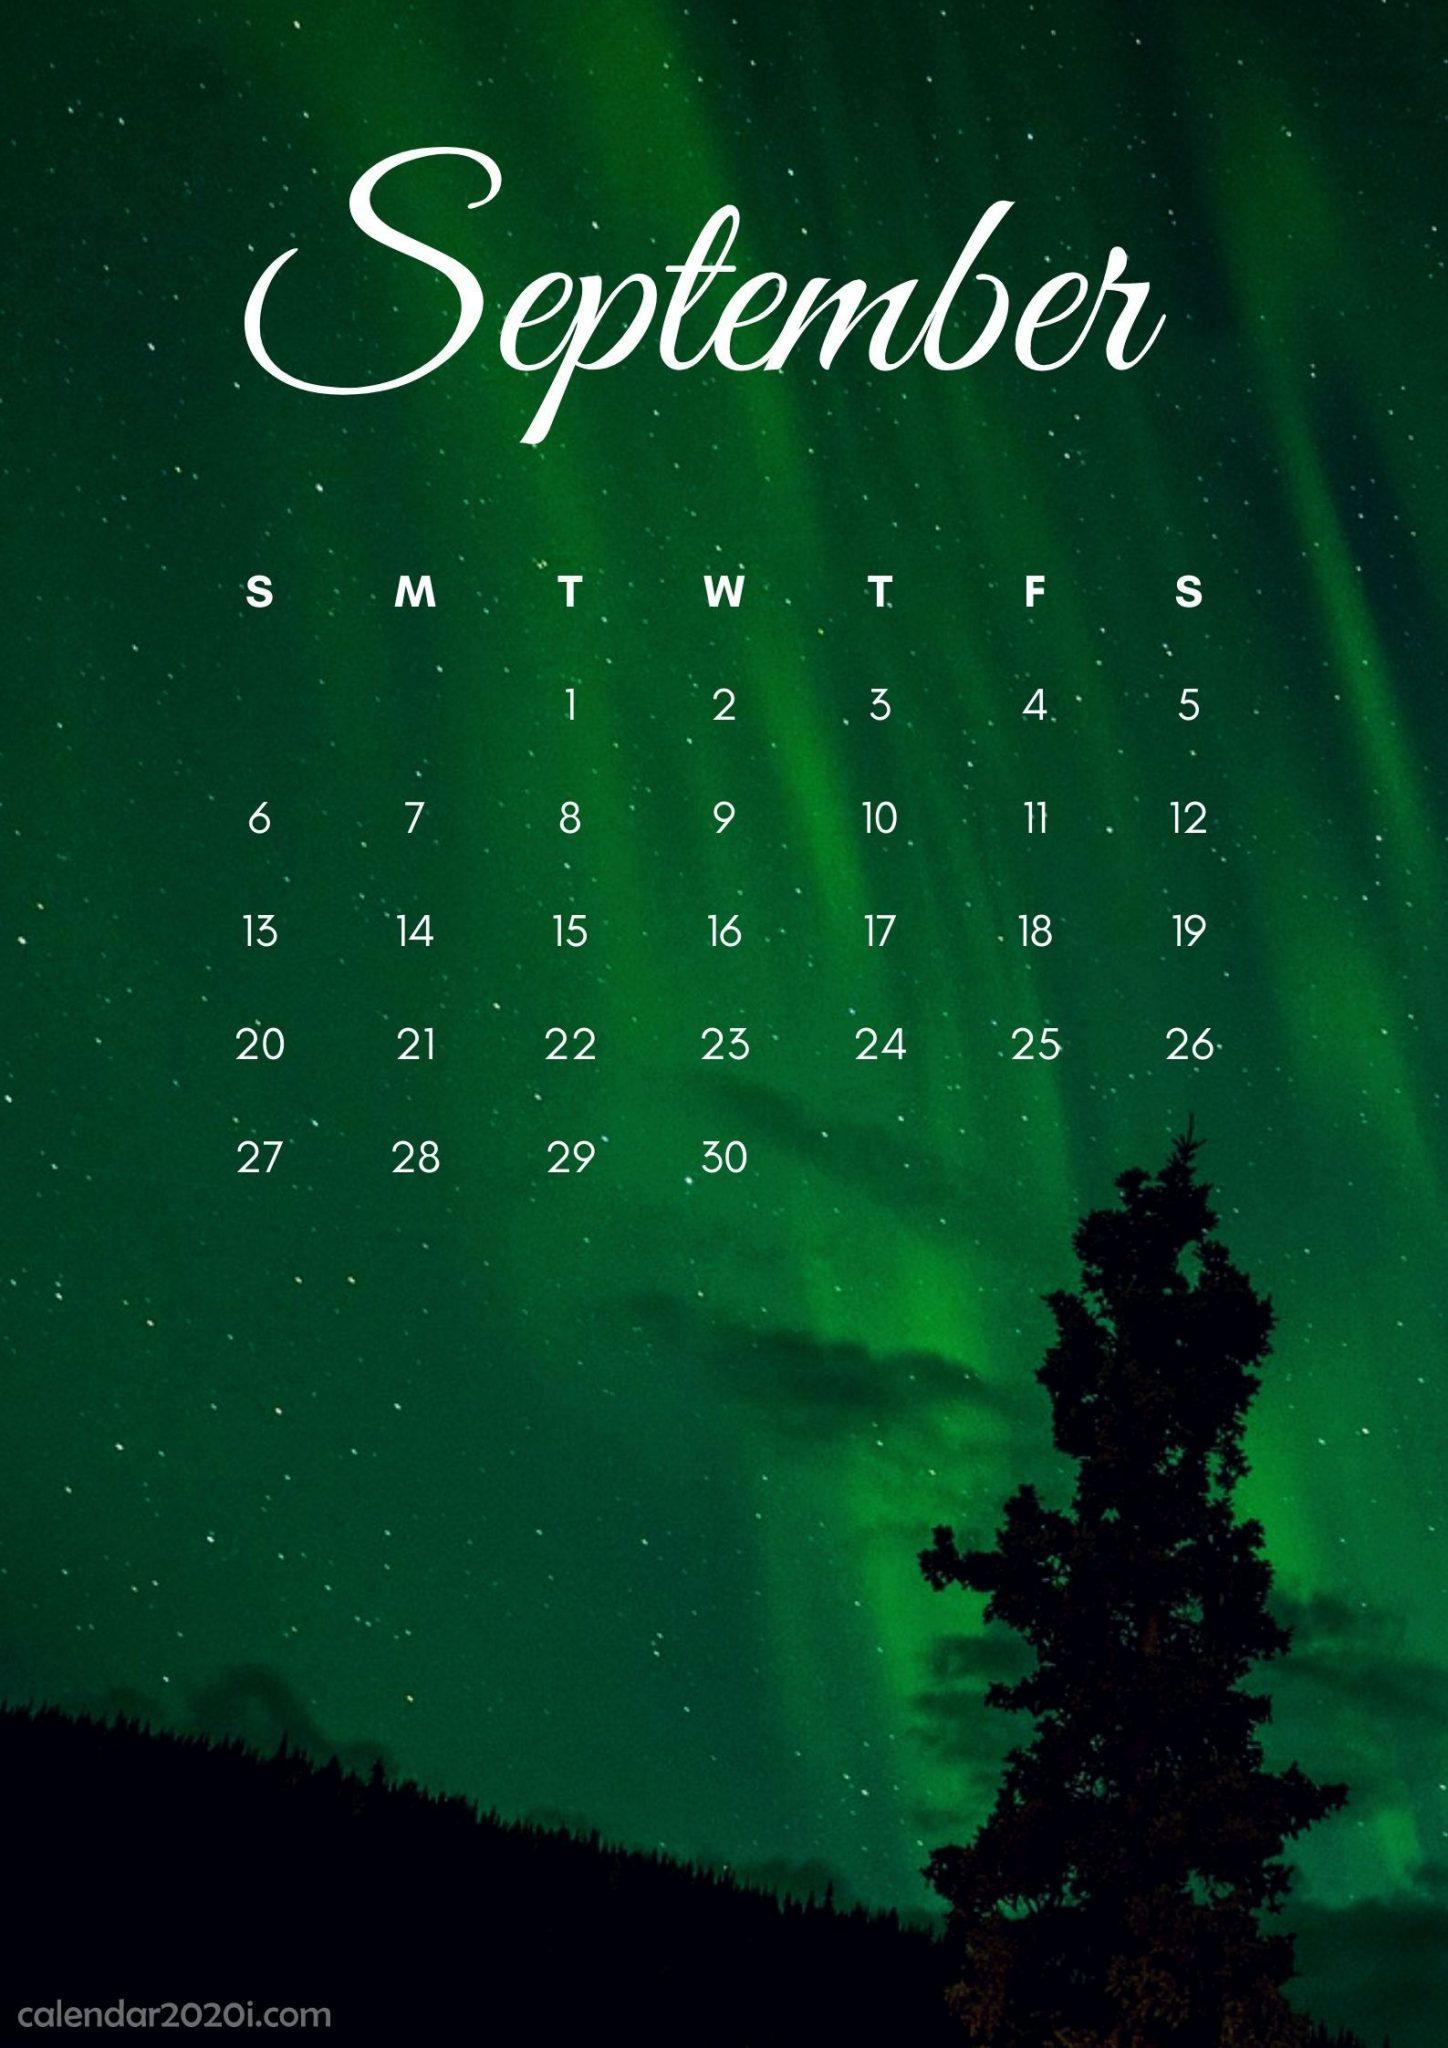 Free September 2020 iPhone Calendar Wallpapers